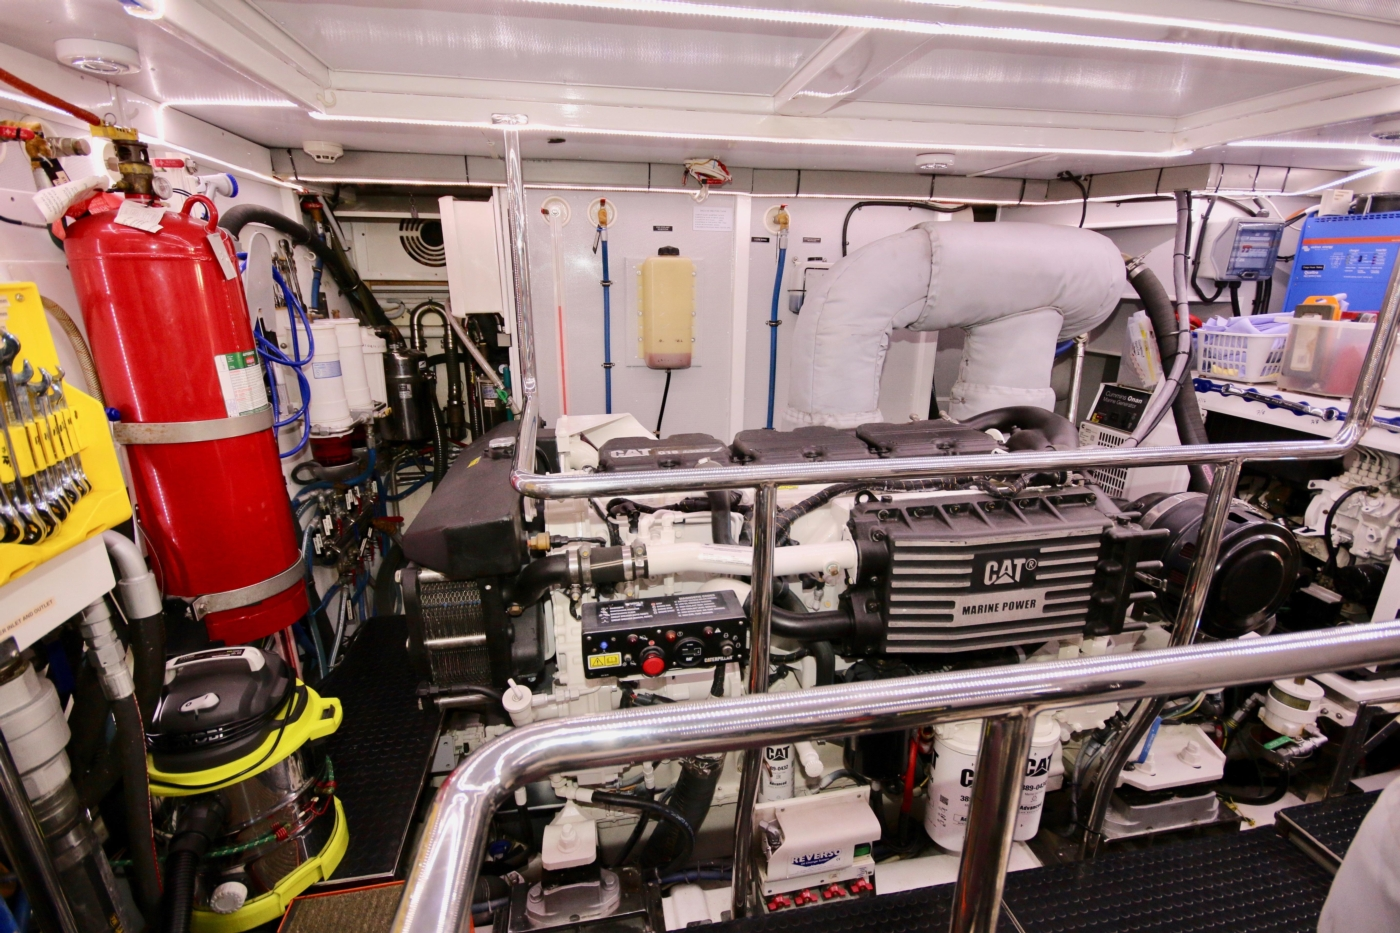 2011 Hampton 75 Endurance LRC, Fire suppression system